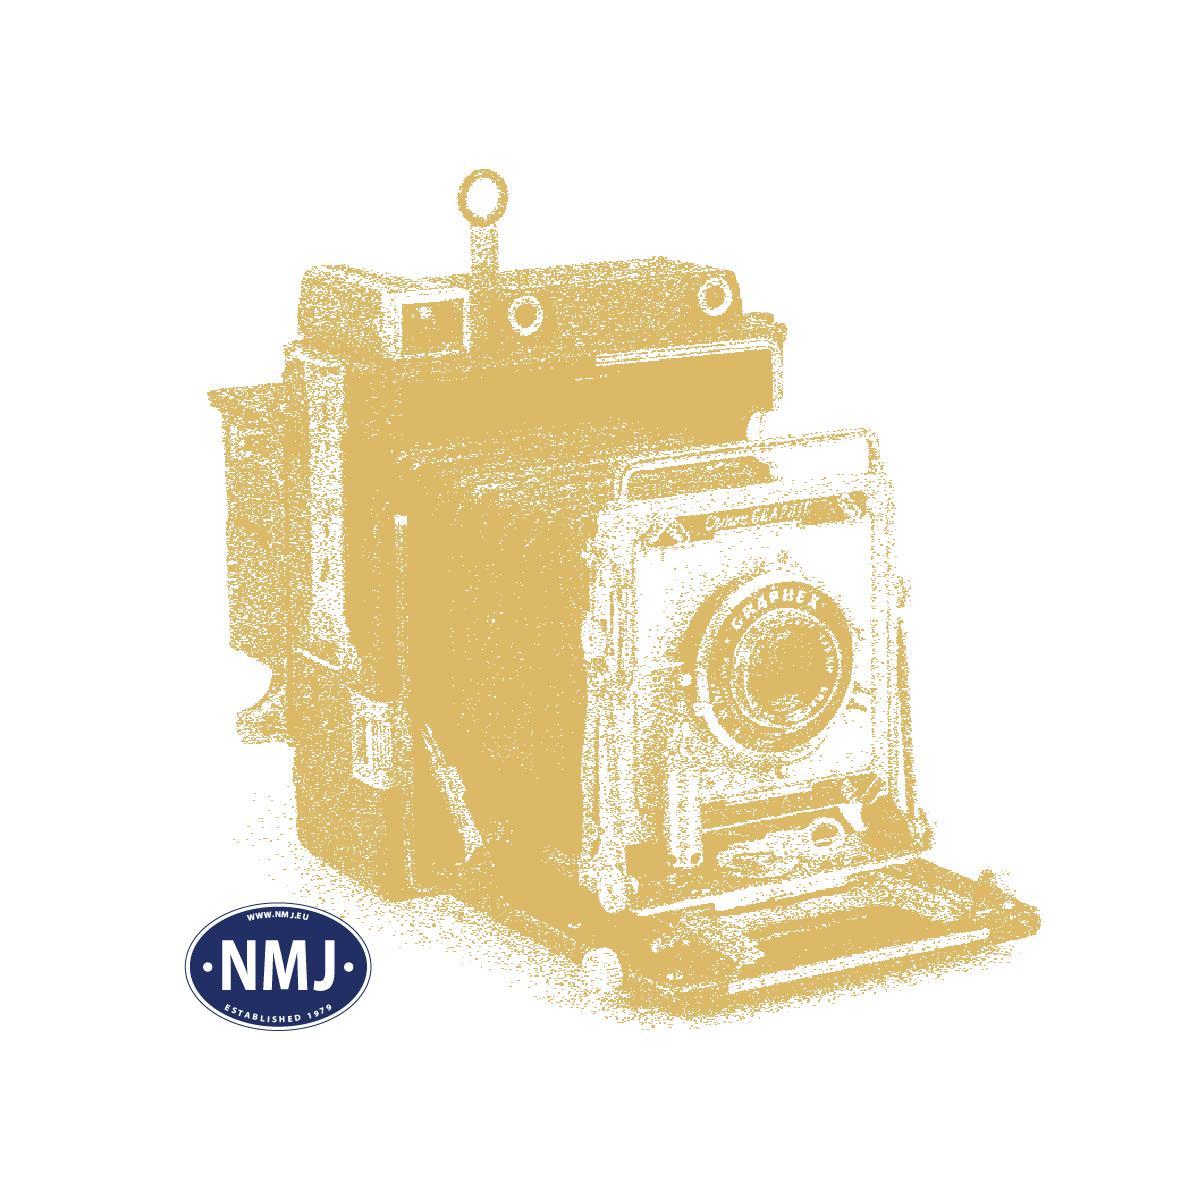 NMJS Elo 0328-5 - *NMJ 40 ÅR* NMJ Superline NSB Elo 21 76 511 0328-5 m/ Bremseplattform